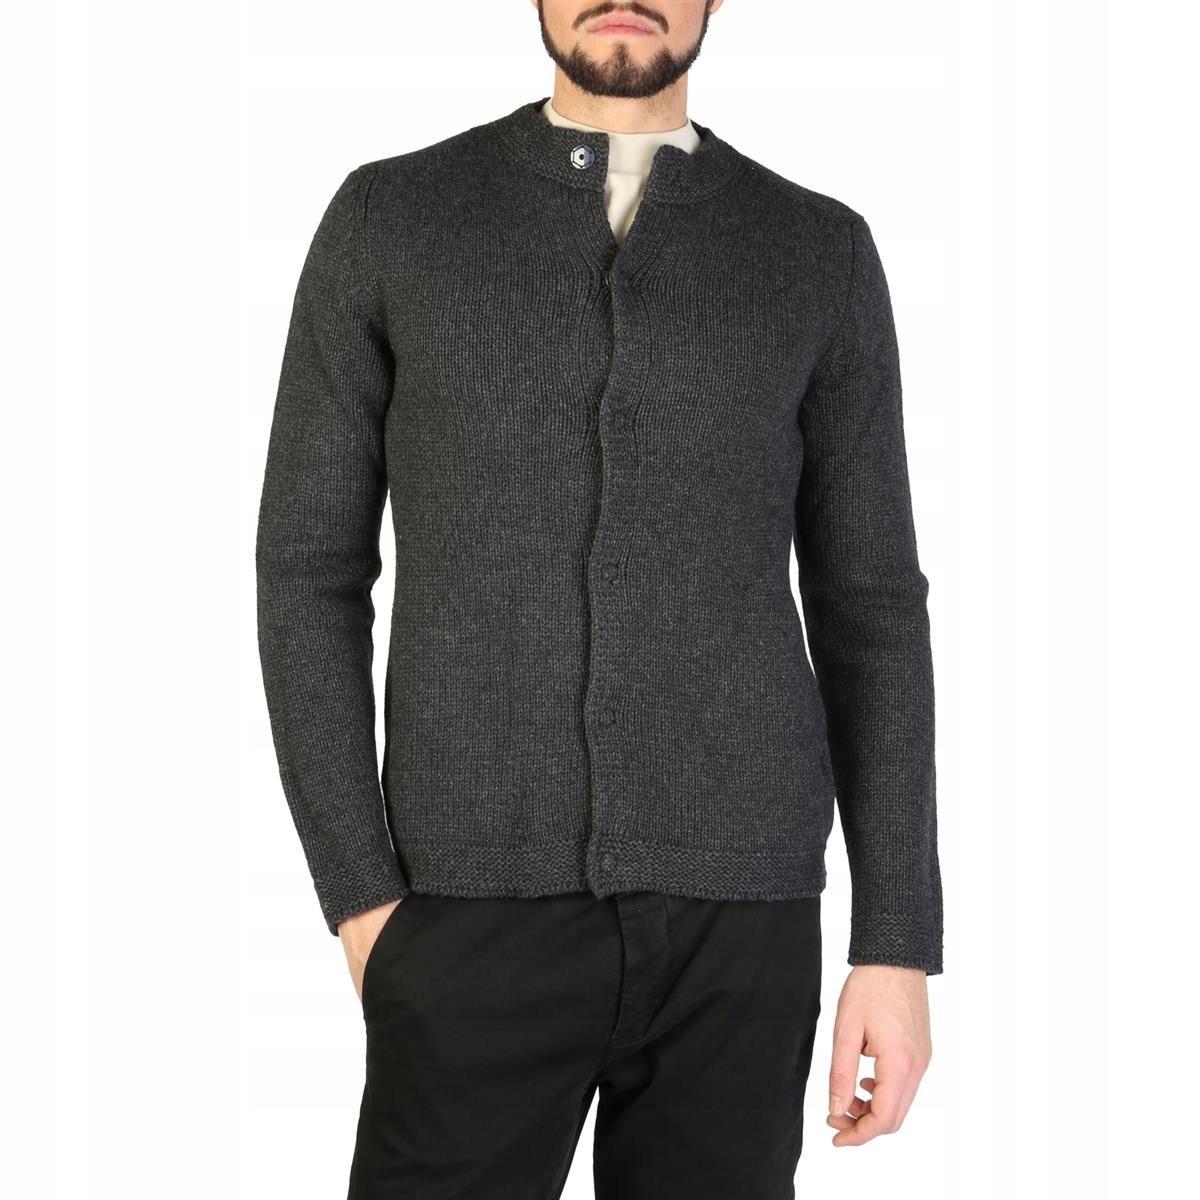 Emporio Armani męski sweter szary 48